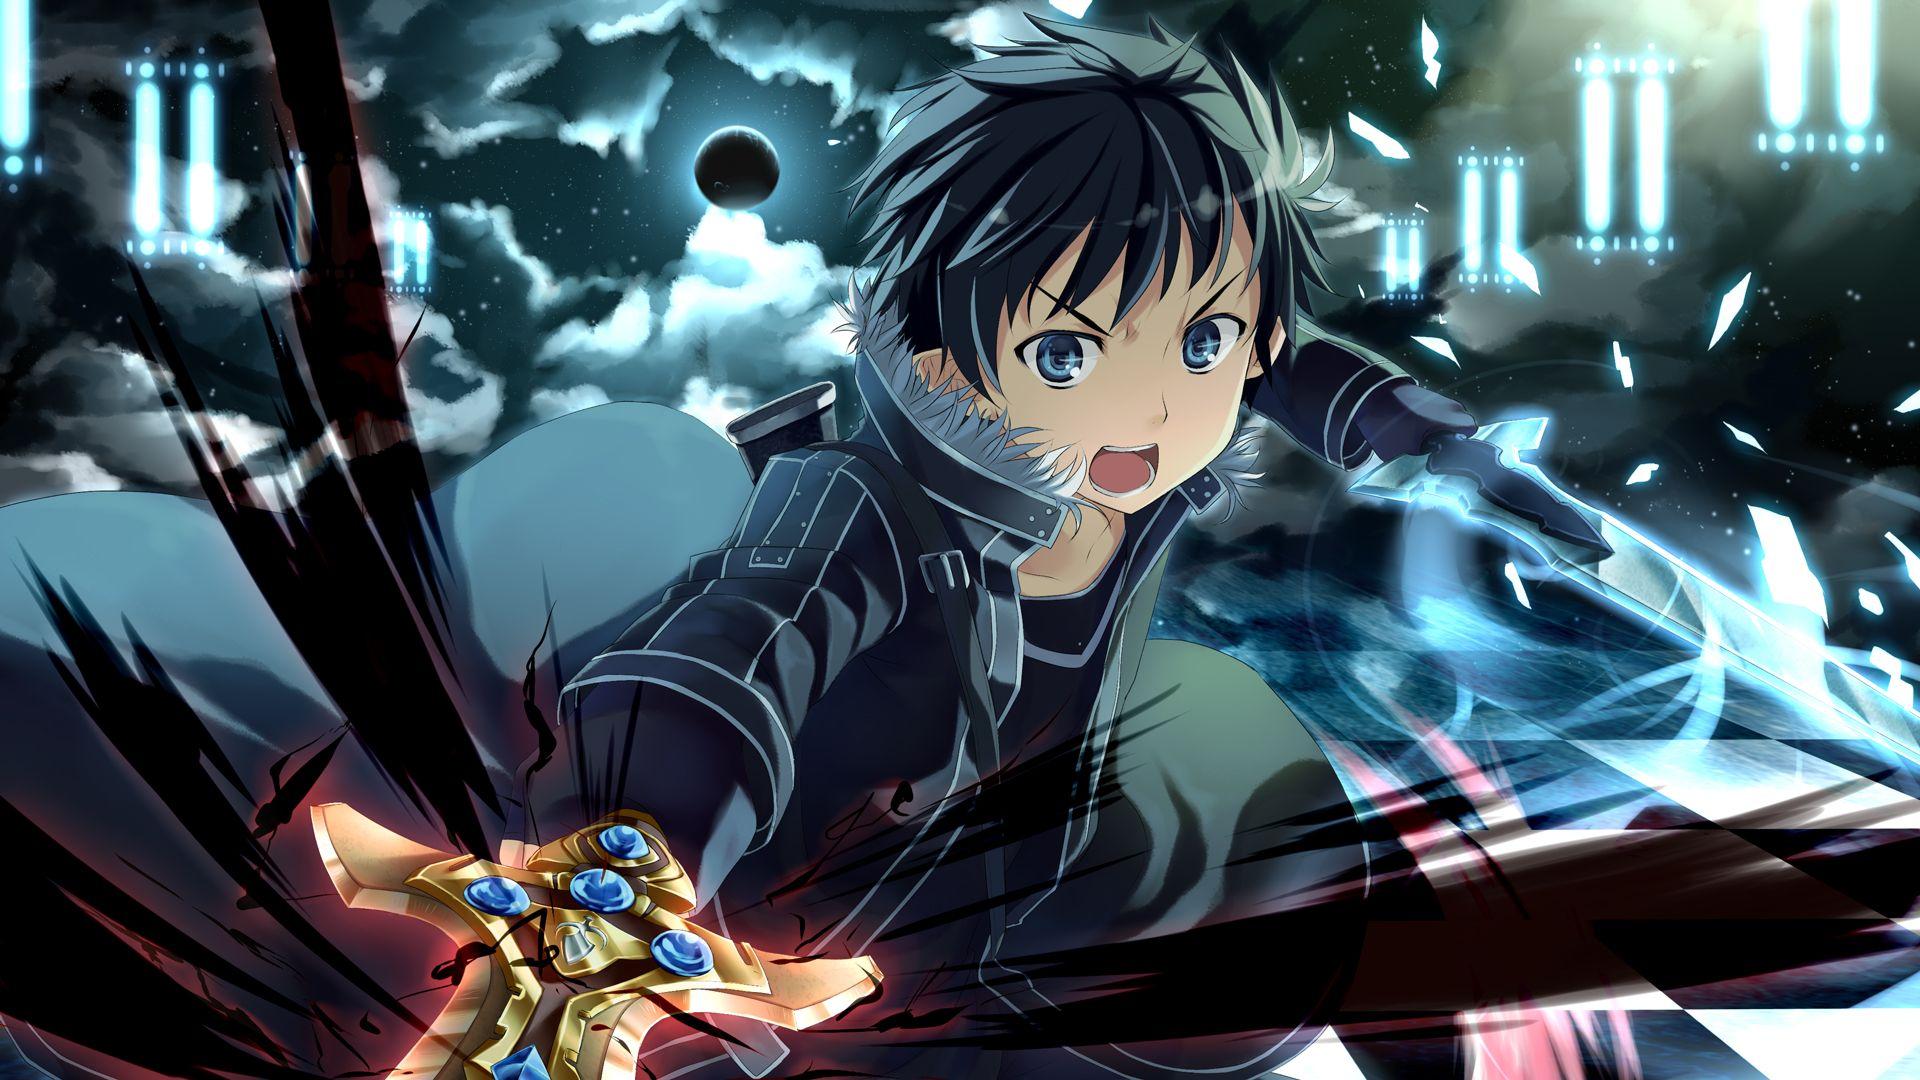 Kirito Sword Art Online Wallpaper Sword Art Online Season